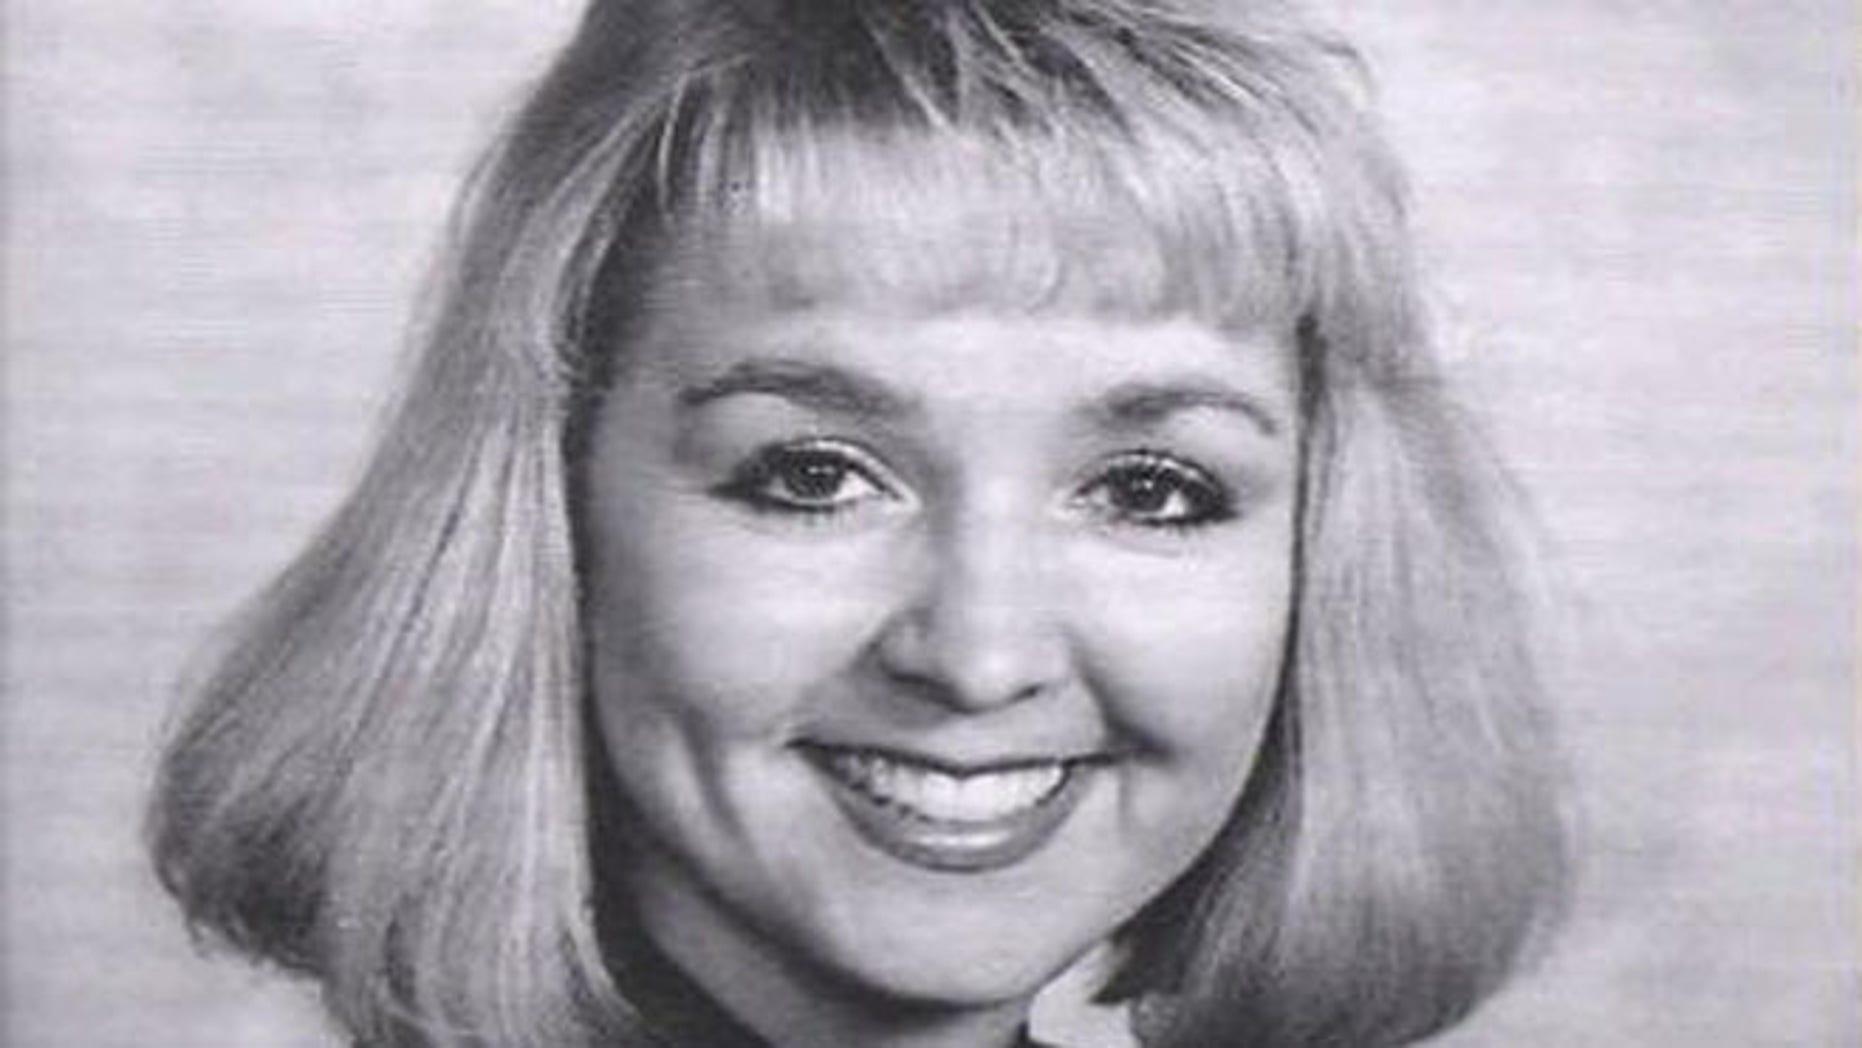 Iowa news anchor Jodi Huisentruit is seen in this undated image.